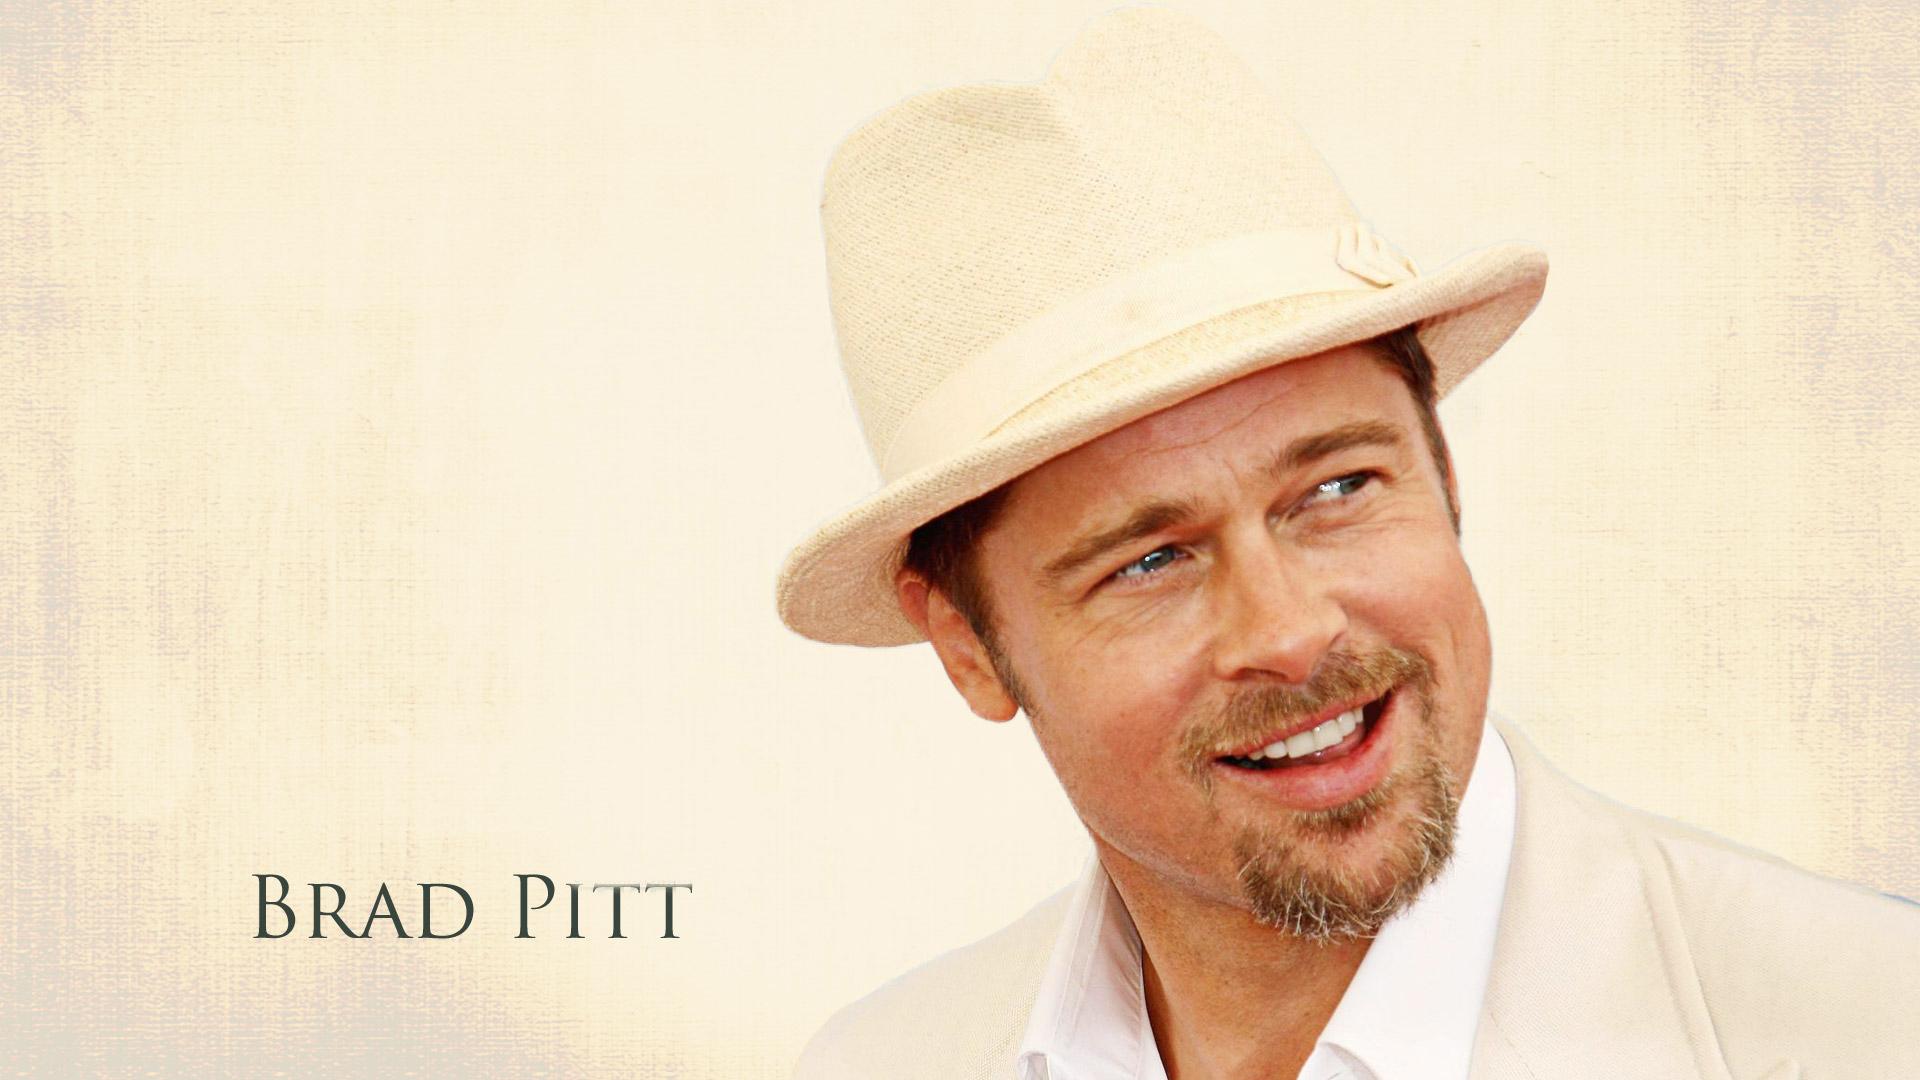 Brad Pitt HD Wallpapers for desktop download 1920x1080